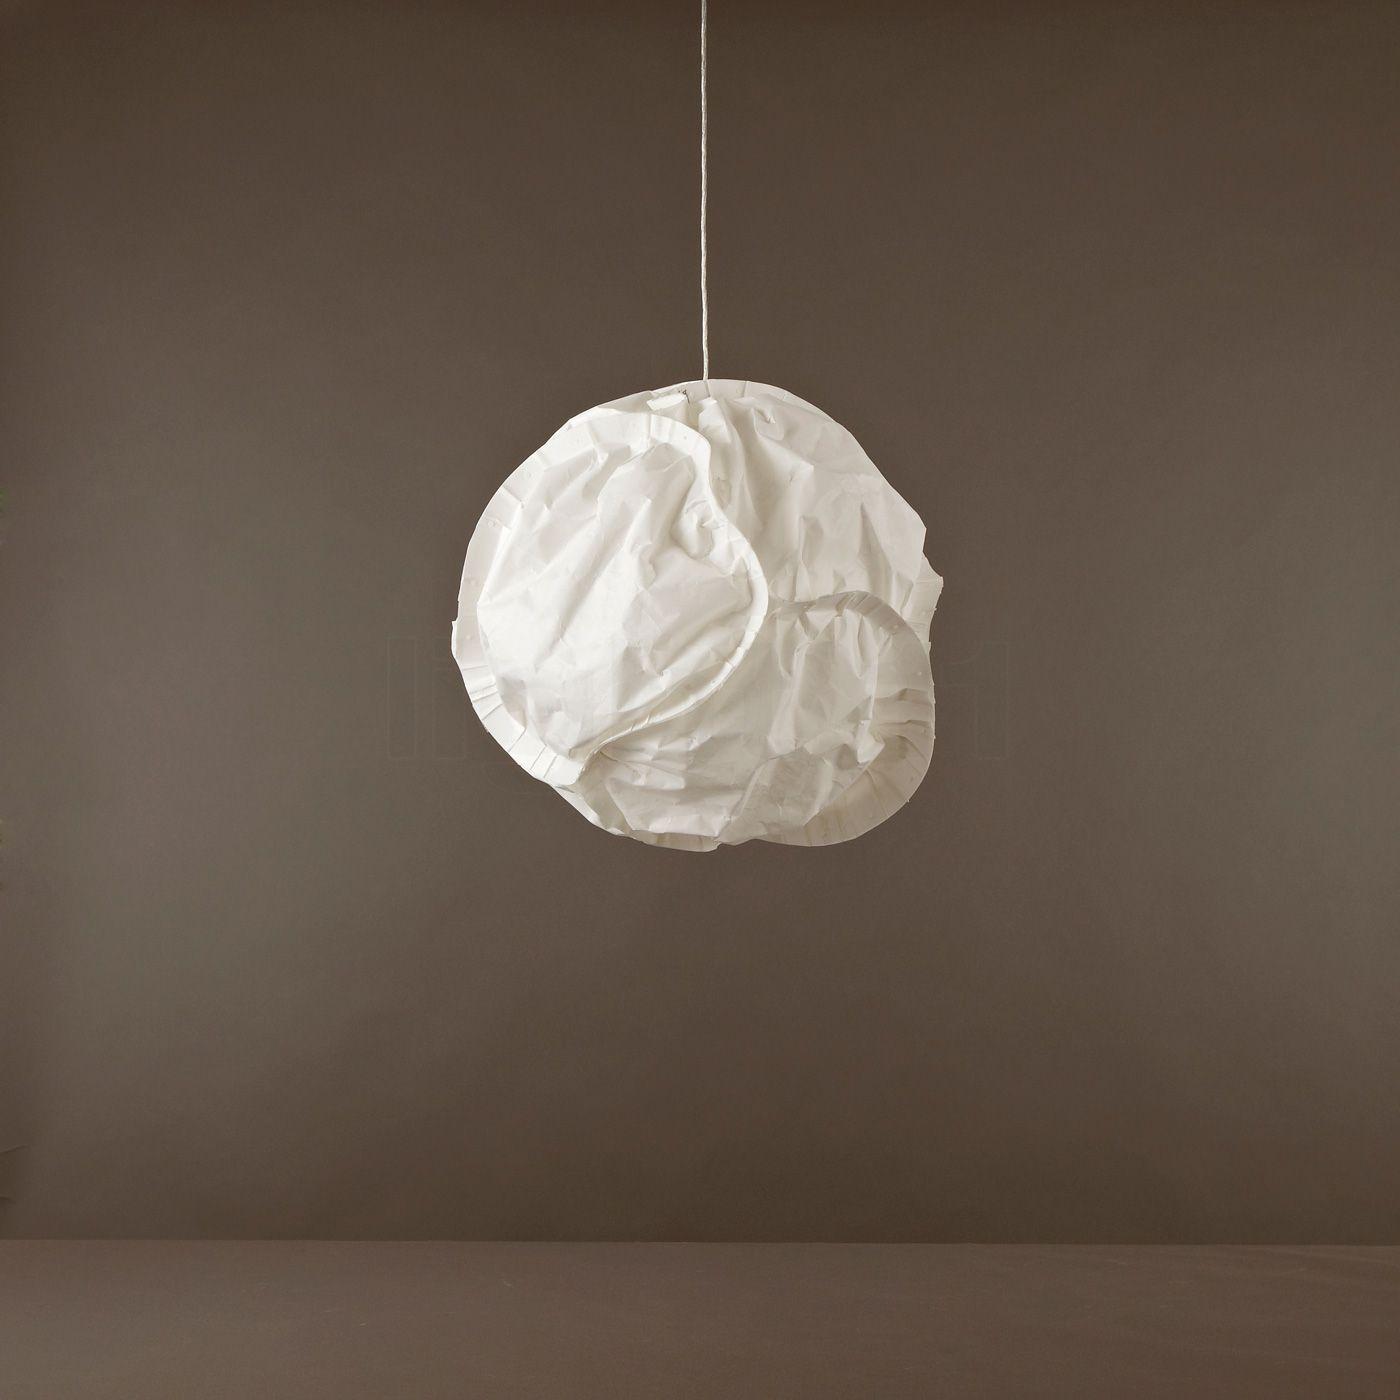 ceiling paper maker product kites cloud projects design art workshops light bridge and